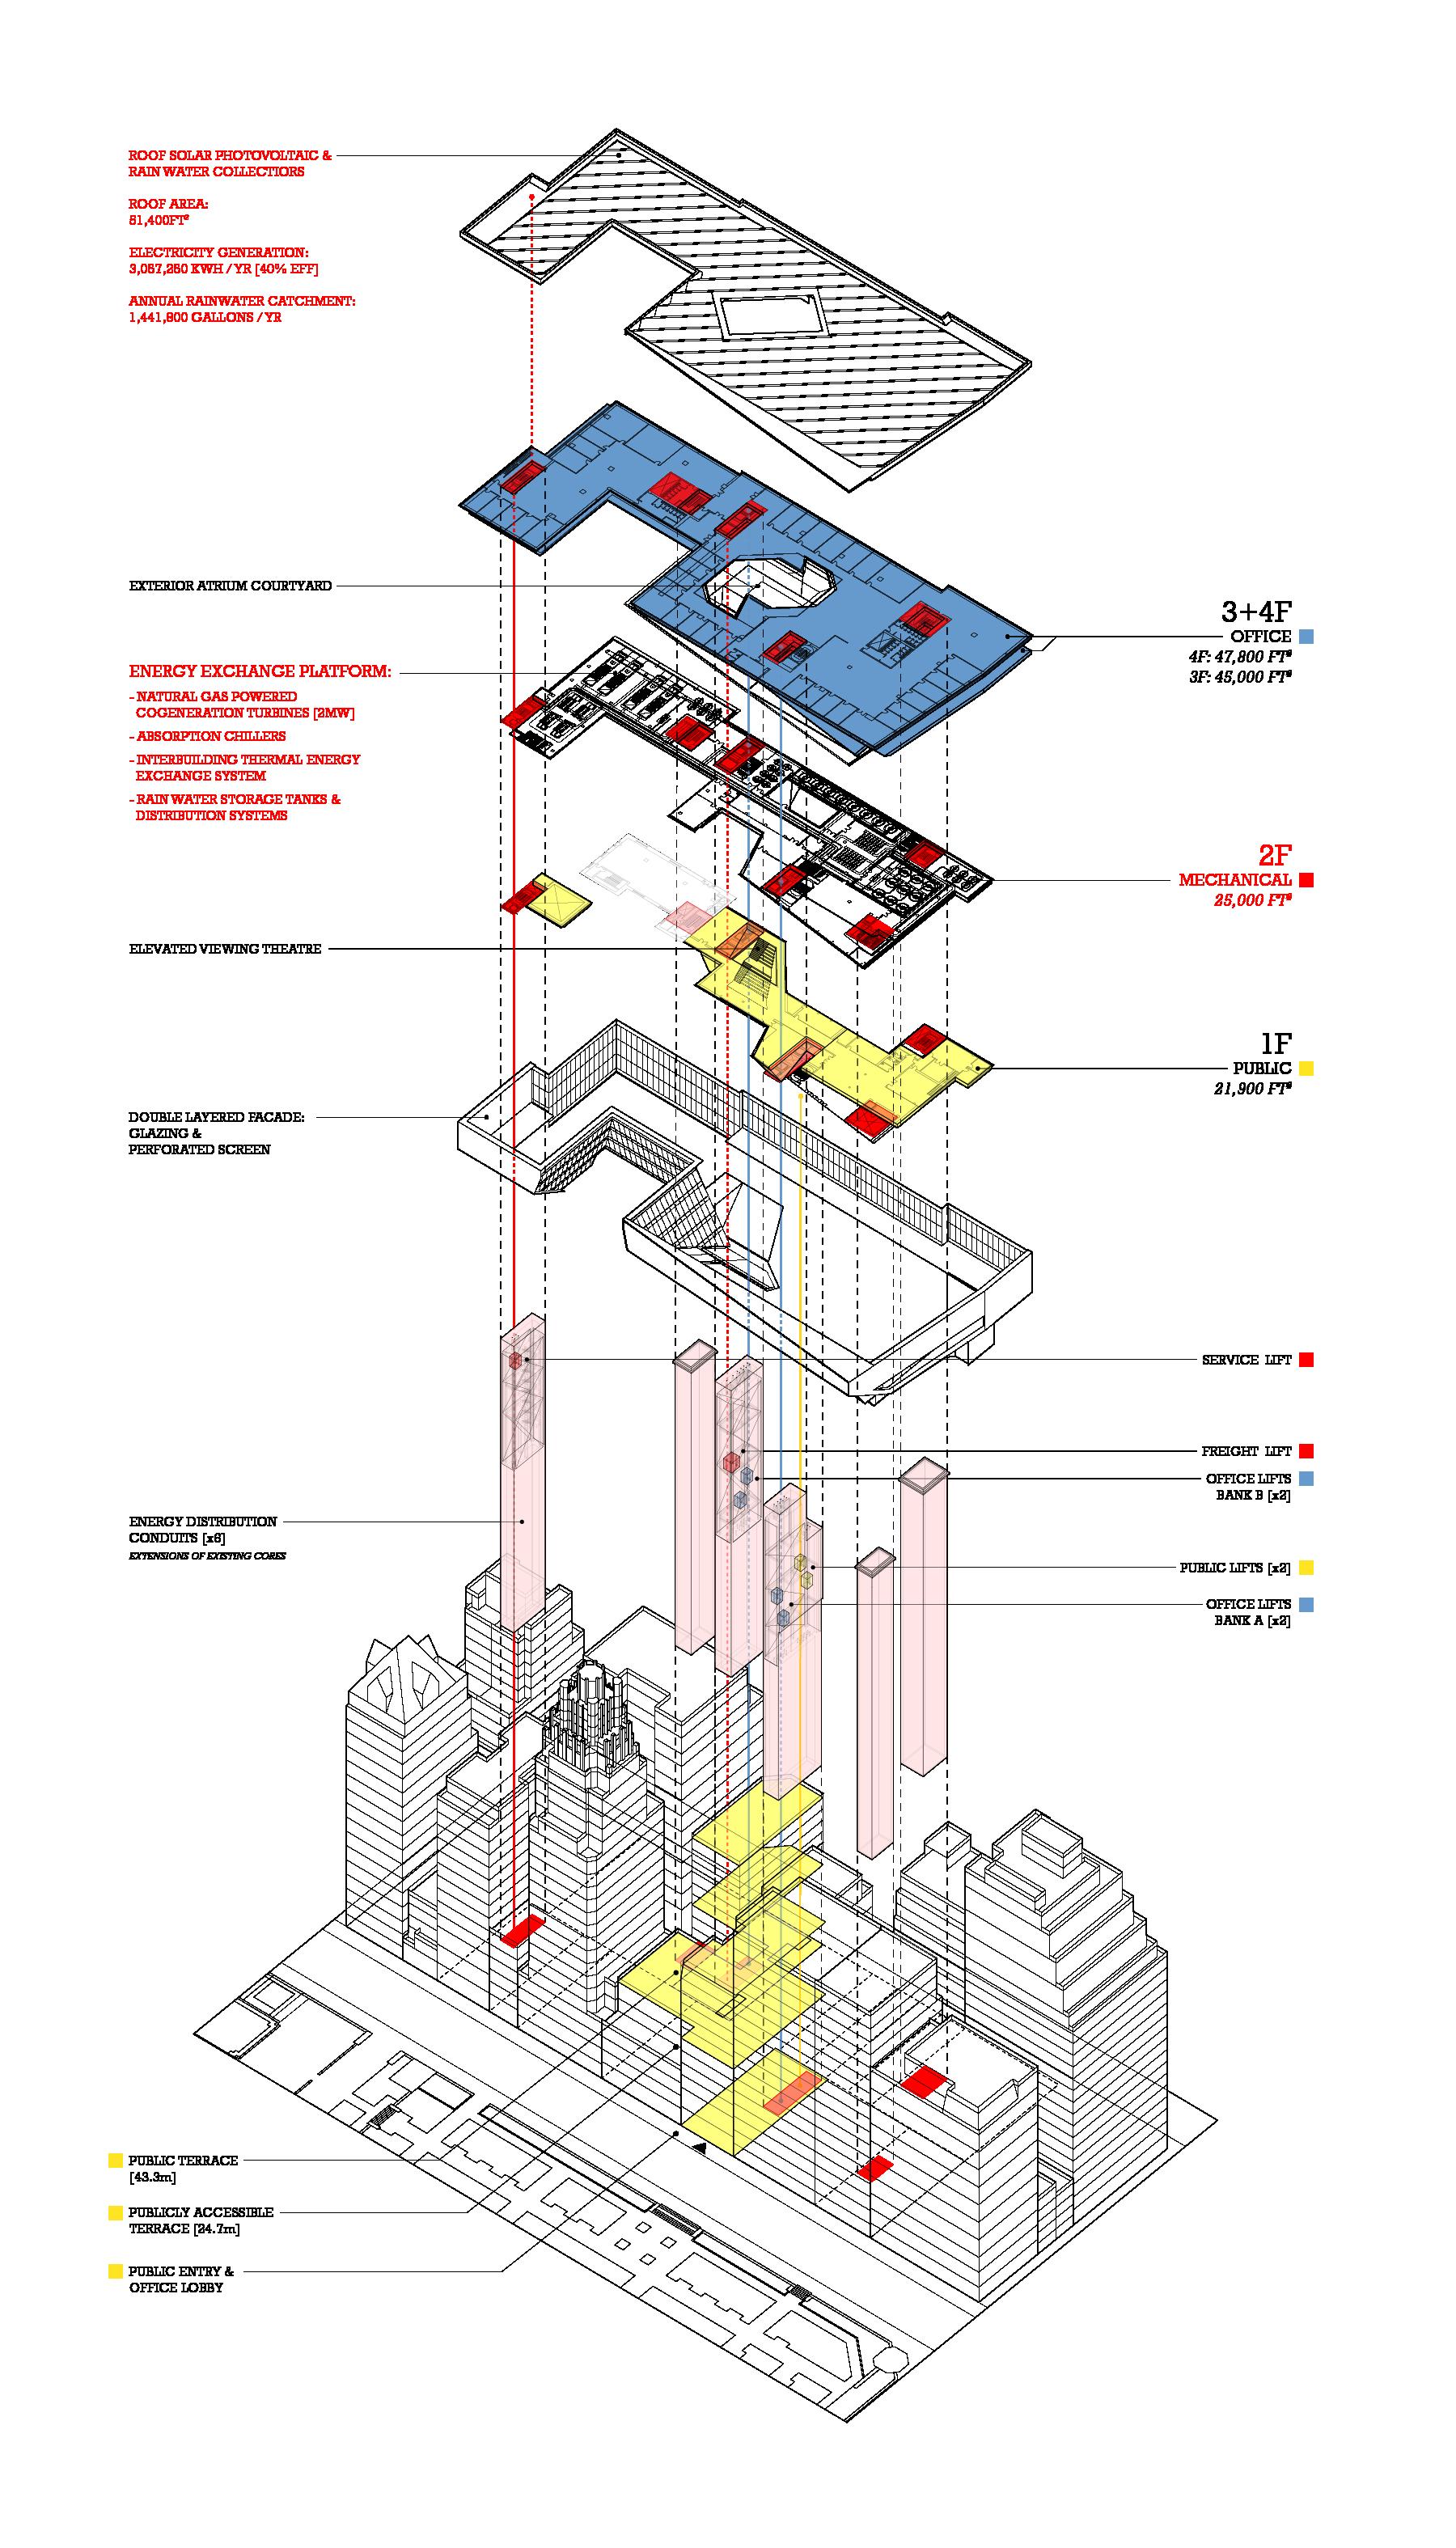 Building Component Axonometric